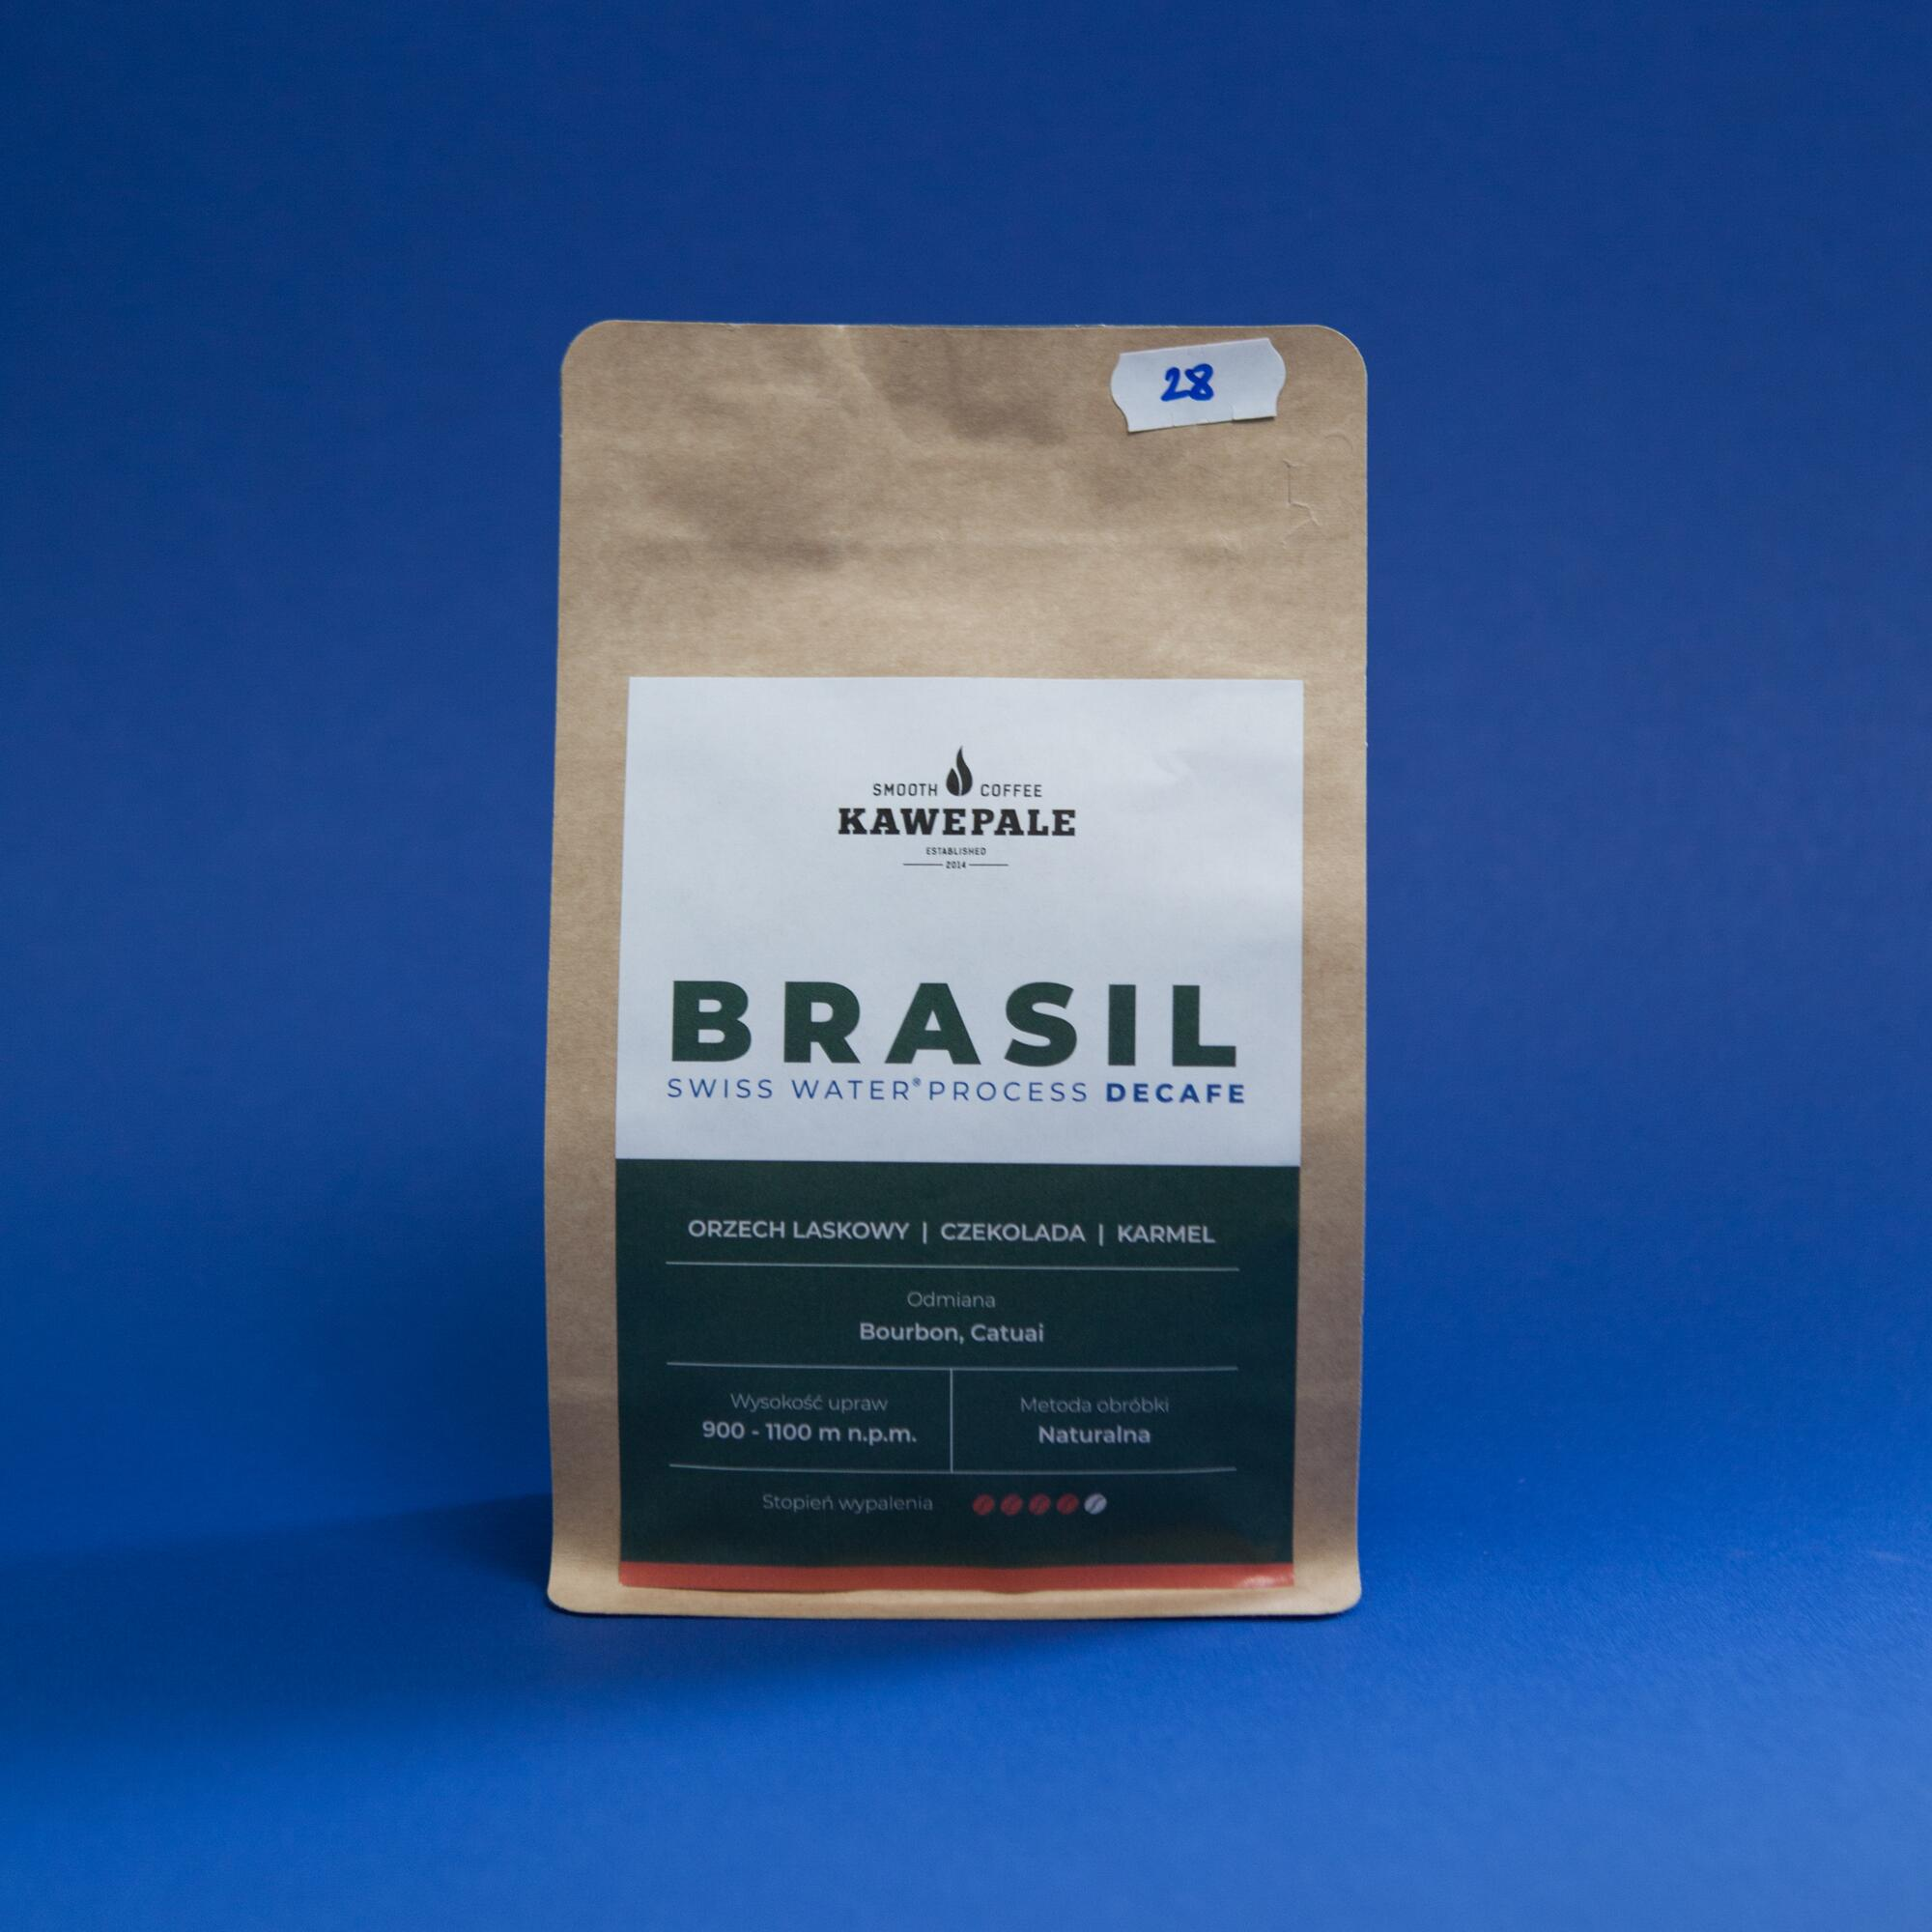 KawePale Brasil Decafe Swiss Water Process 250g - Coffee Gang | JestemSlow.pl